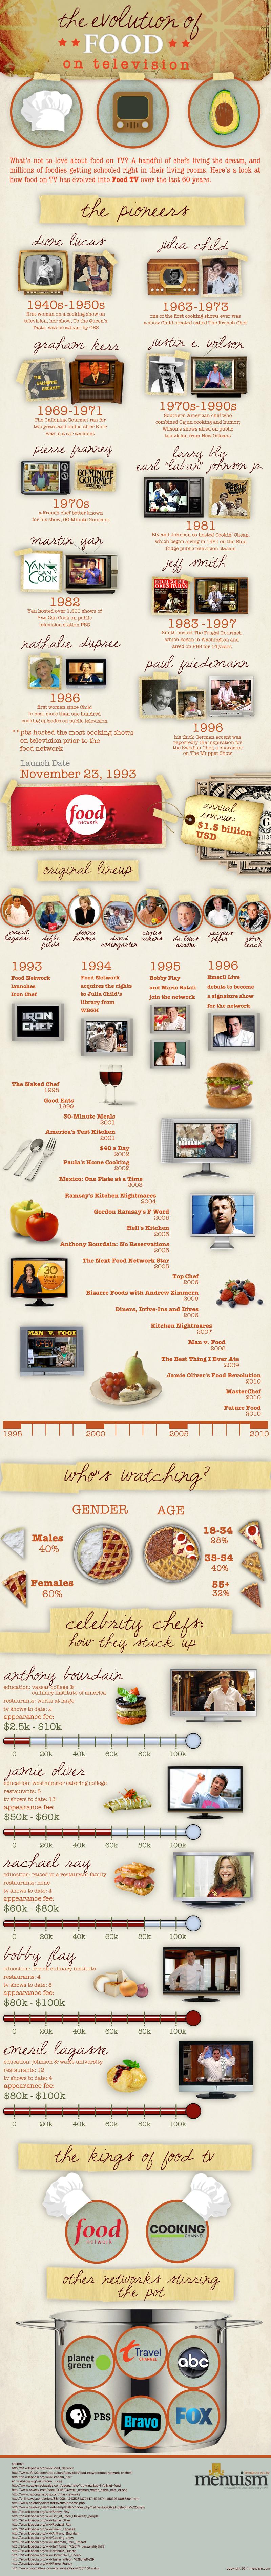 Evolution of Food on TV